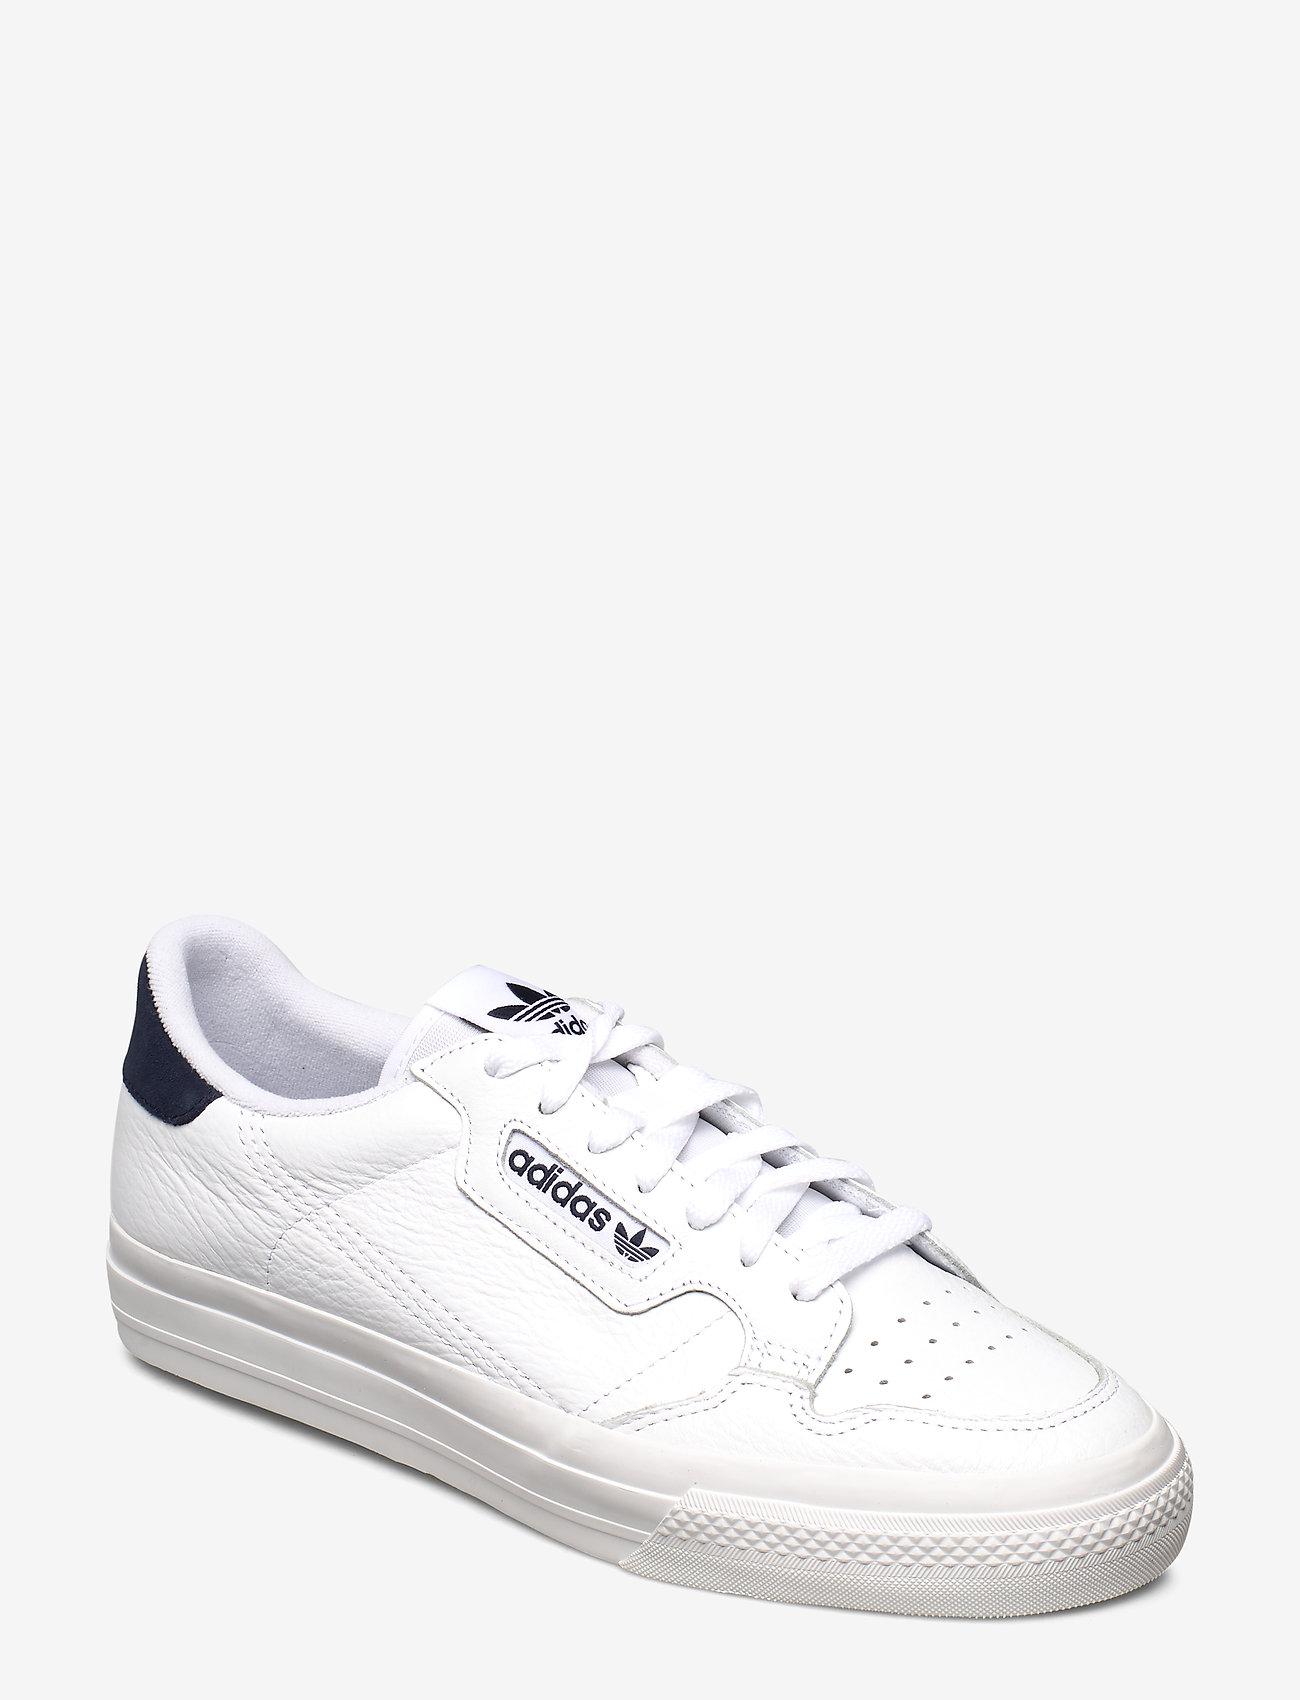 adidas Originals - CONTINENTAL VULC - lave sneakers - ftwwht/ftwwht/conavy - 0